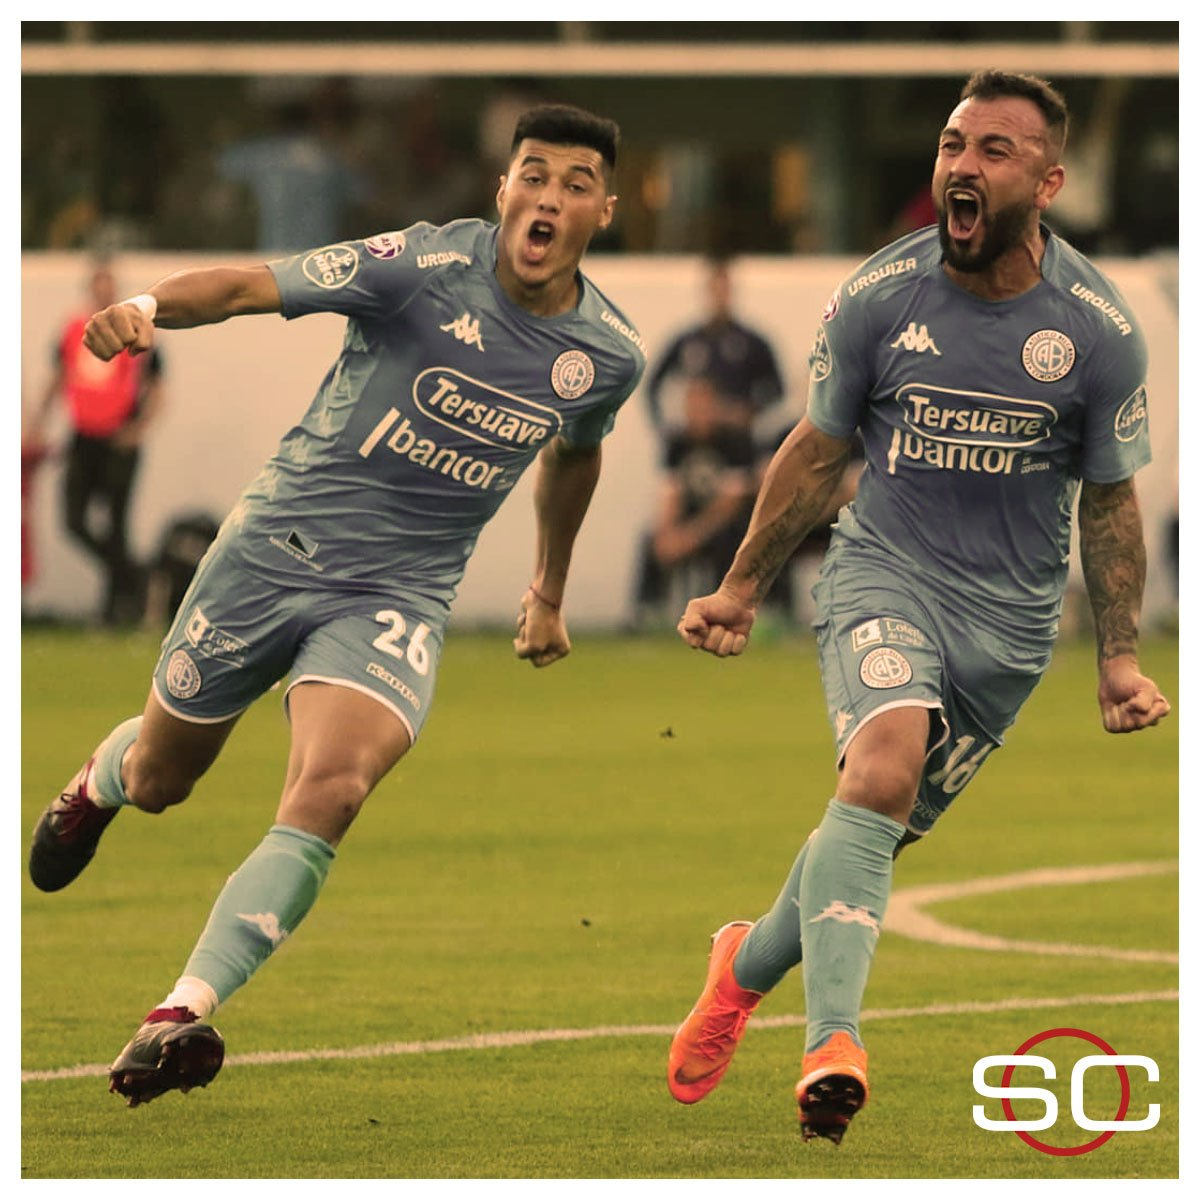 Belgrano Cordoba 2 Gimnasia La Plata 0 - Superliga 2018/19 (Fecha 11) - Vídeo DrCTFKaX0AAcAa3